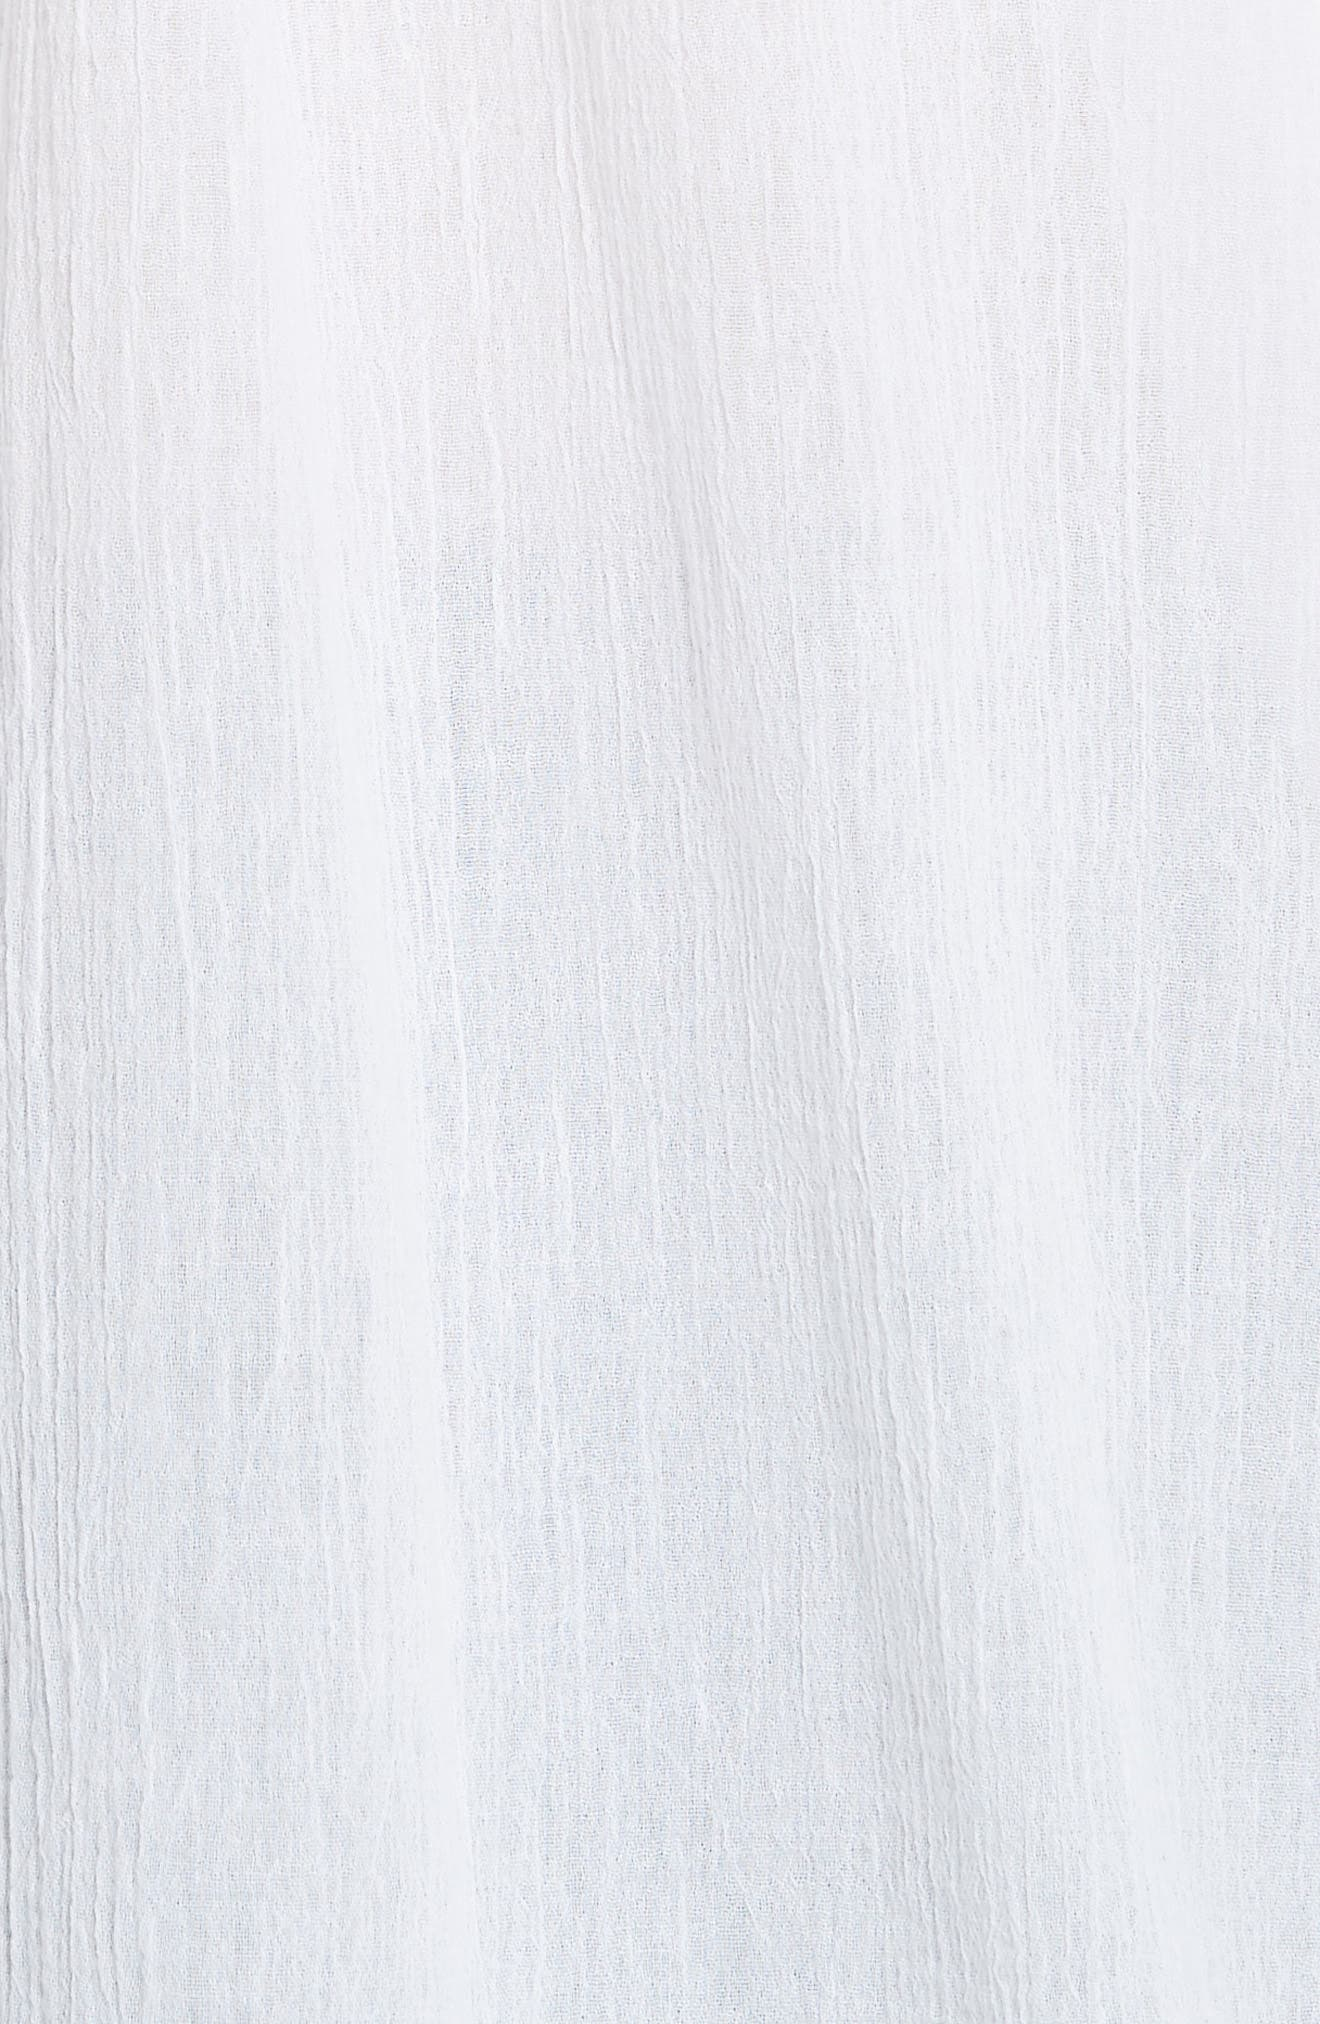 Cotton Poet Blouse,                             Alternate thumbnail 5, color,                             White